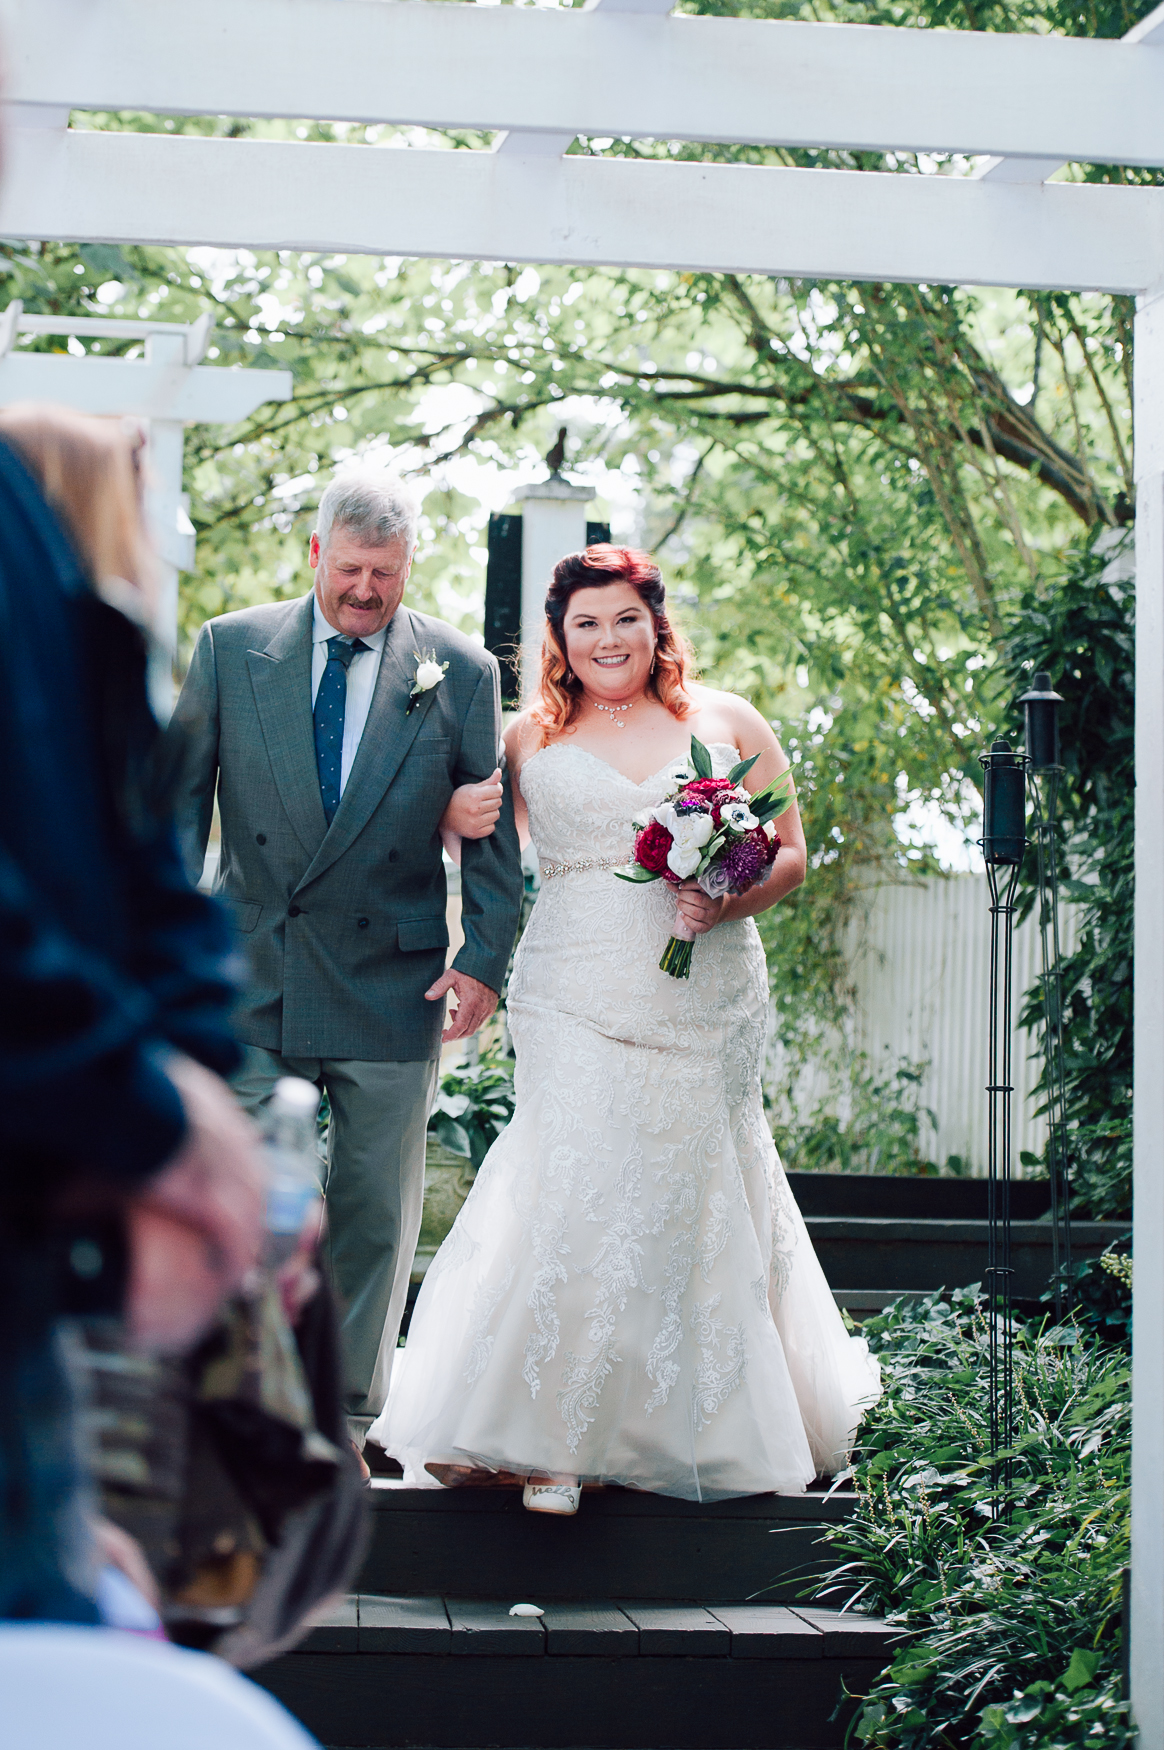 virginiawedding_GlenGarden_rusticwedding_fredericksburg_youseephotography_KellySteven (28).jpg